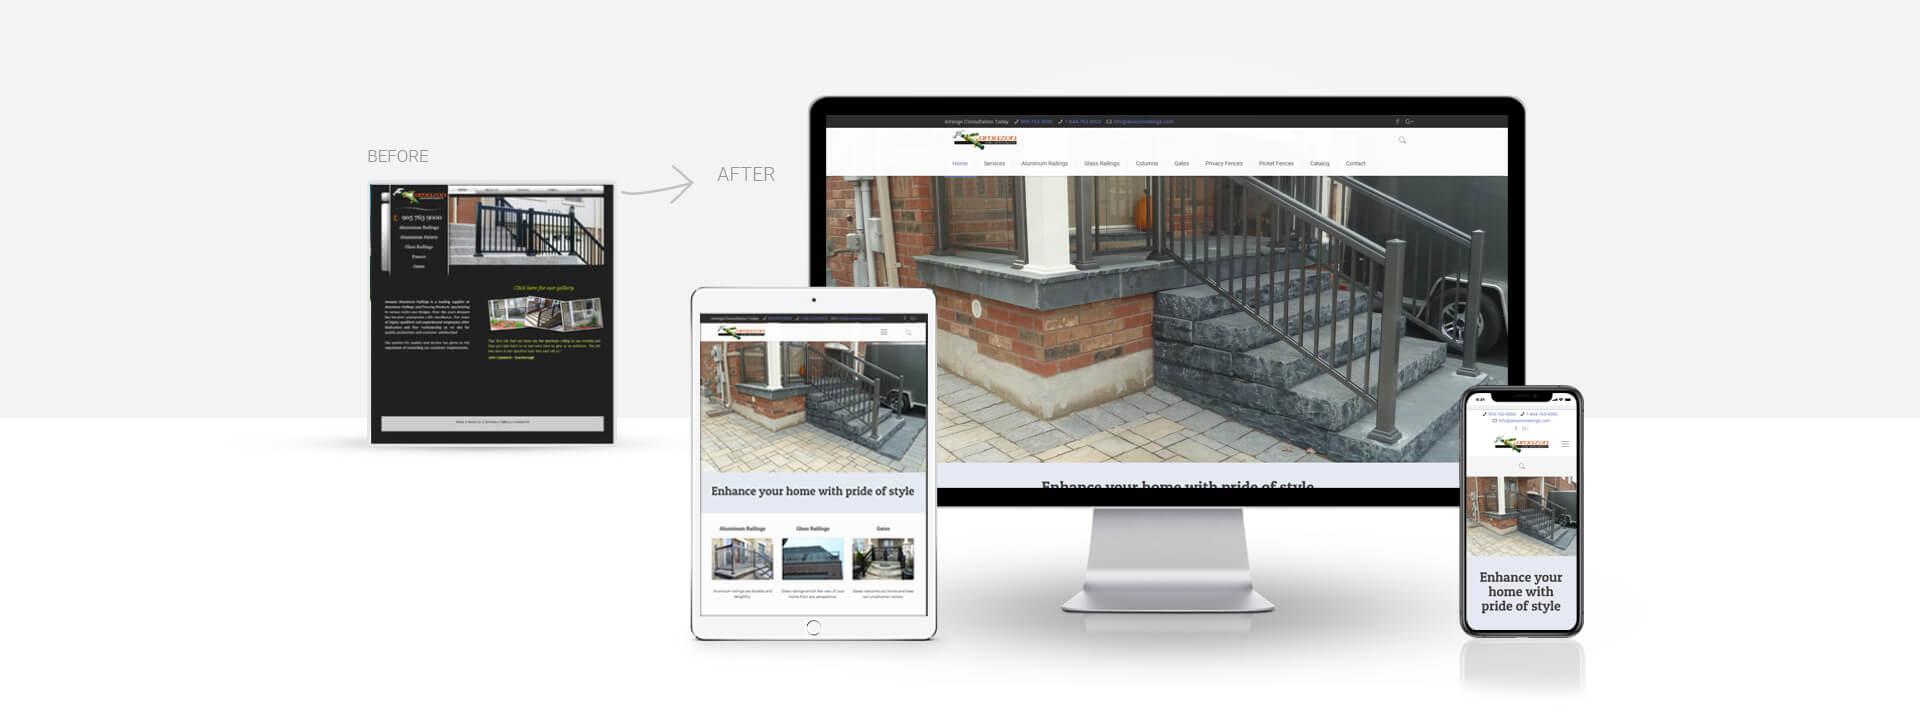 Wordpress Home Improvement Services website